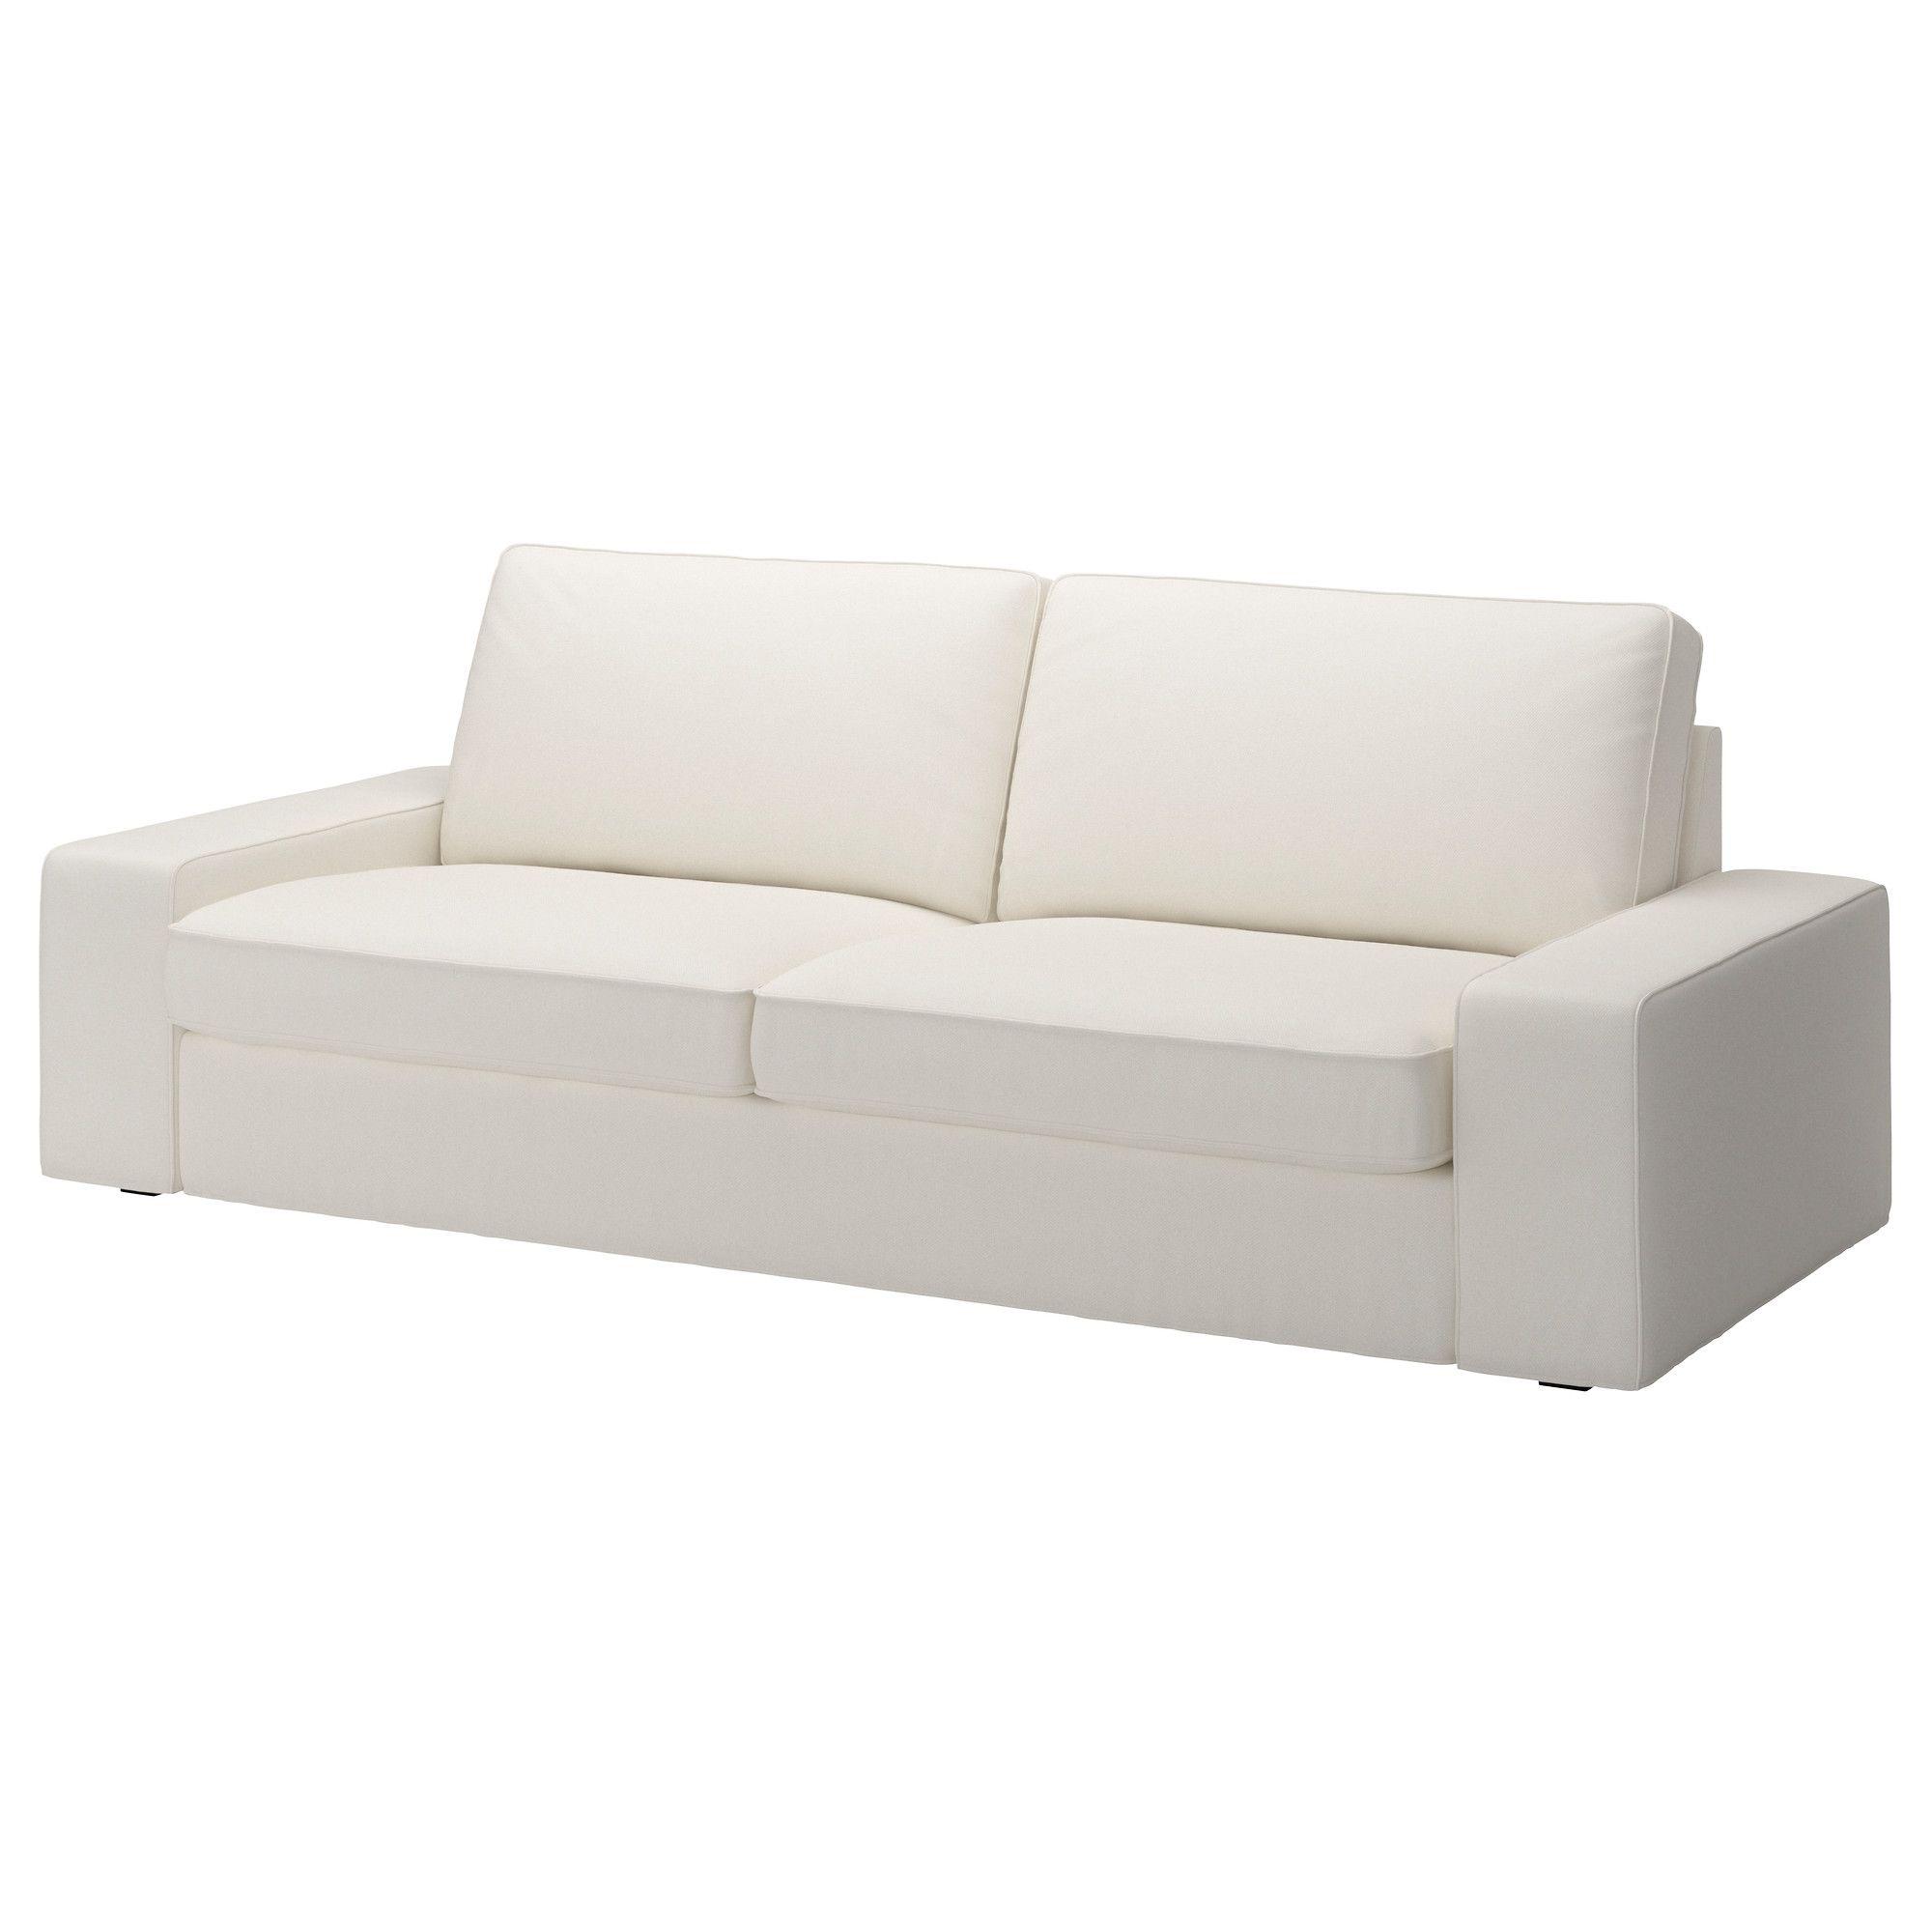 Unique Canapes Ikea